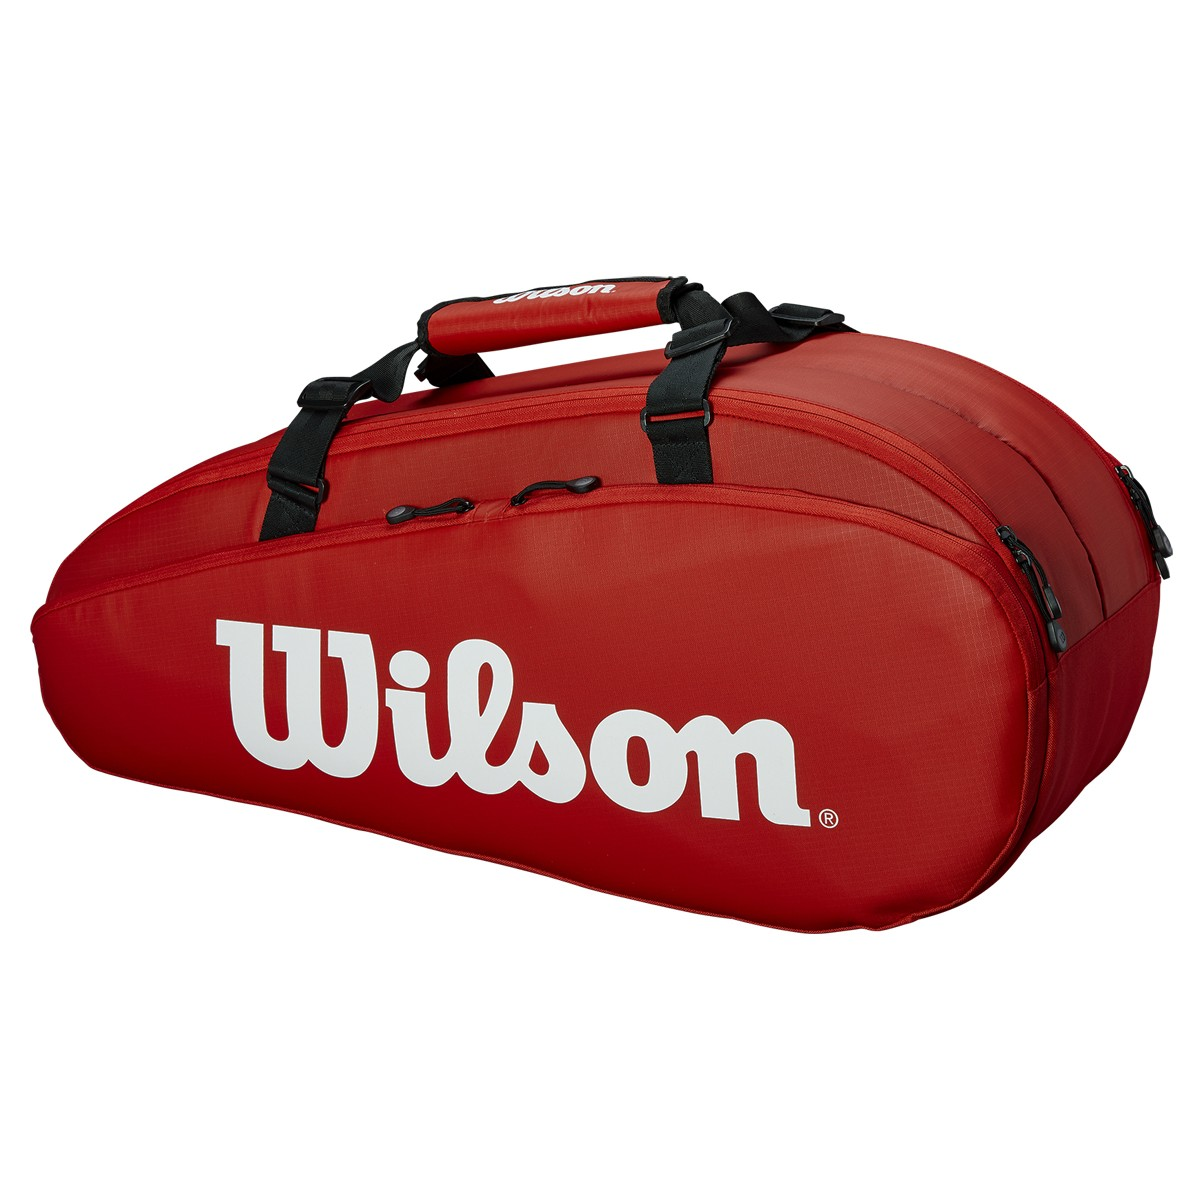 WILSON TOUR 2 COMP SMALL TENNIS BAG